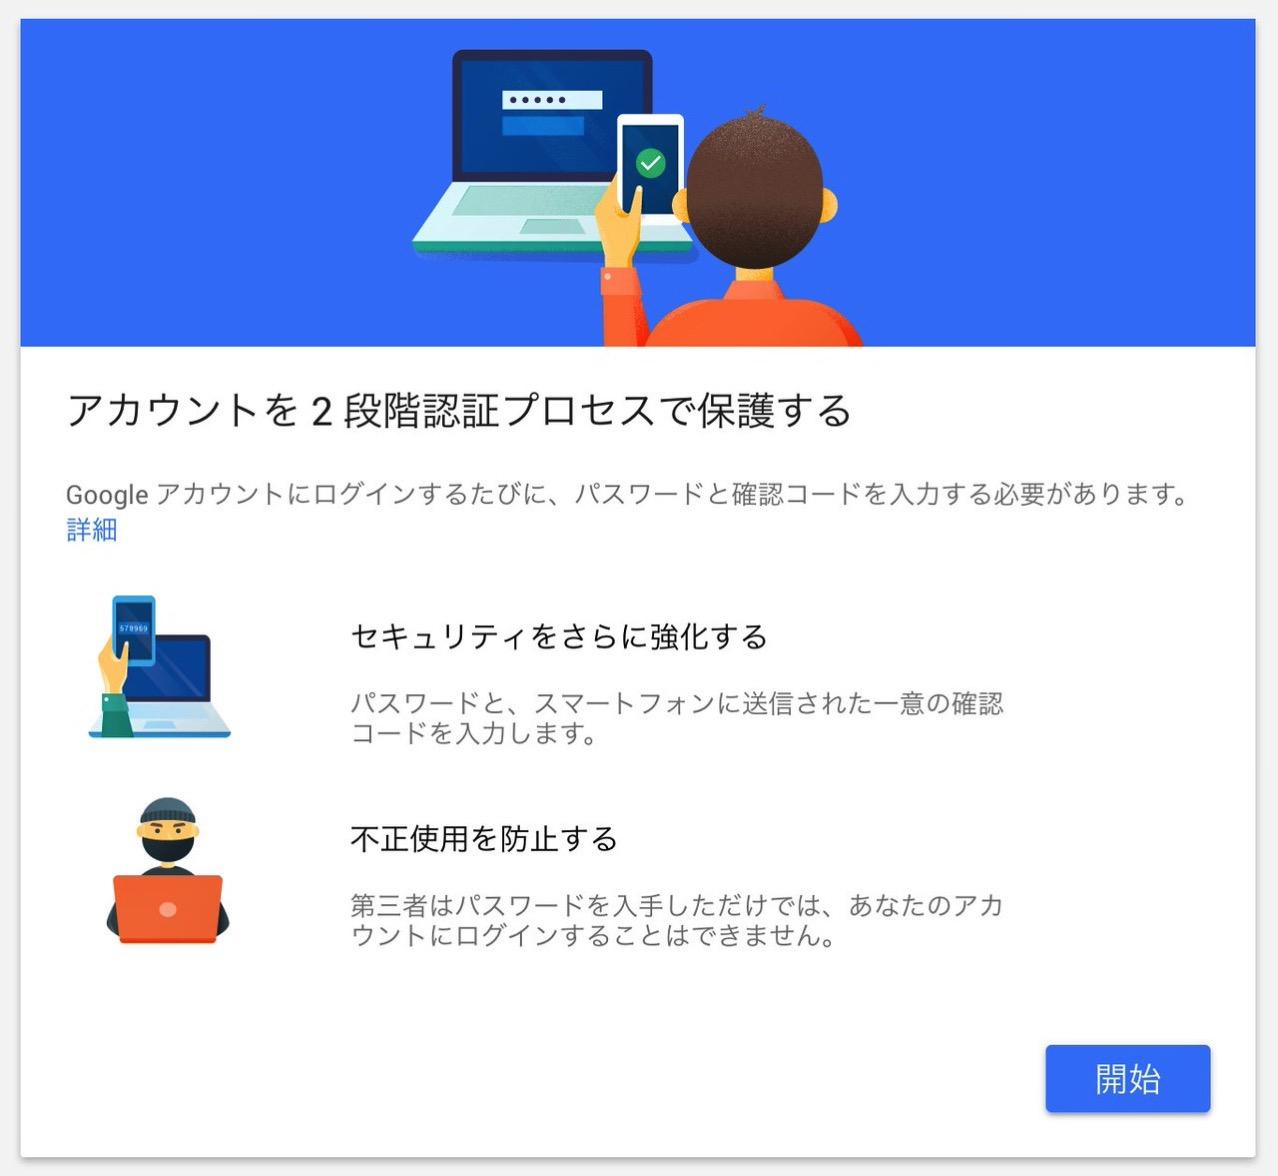 Google 06 23 1049 1